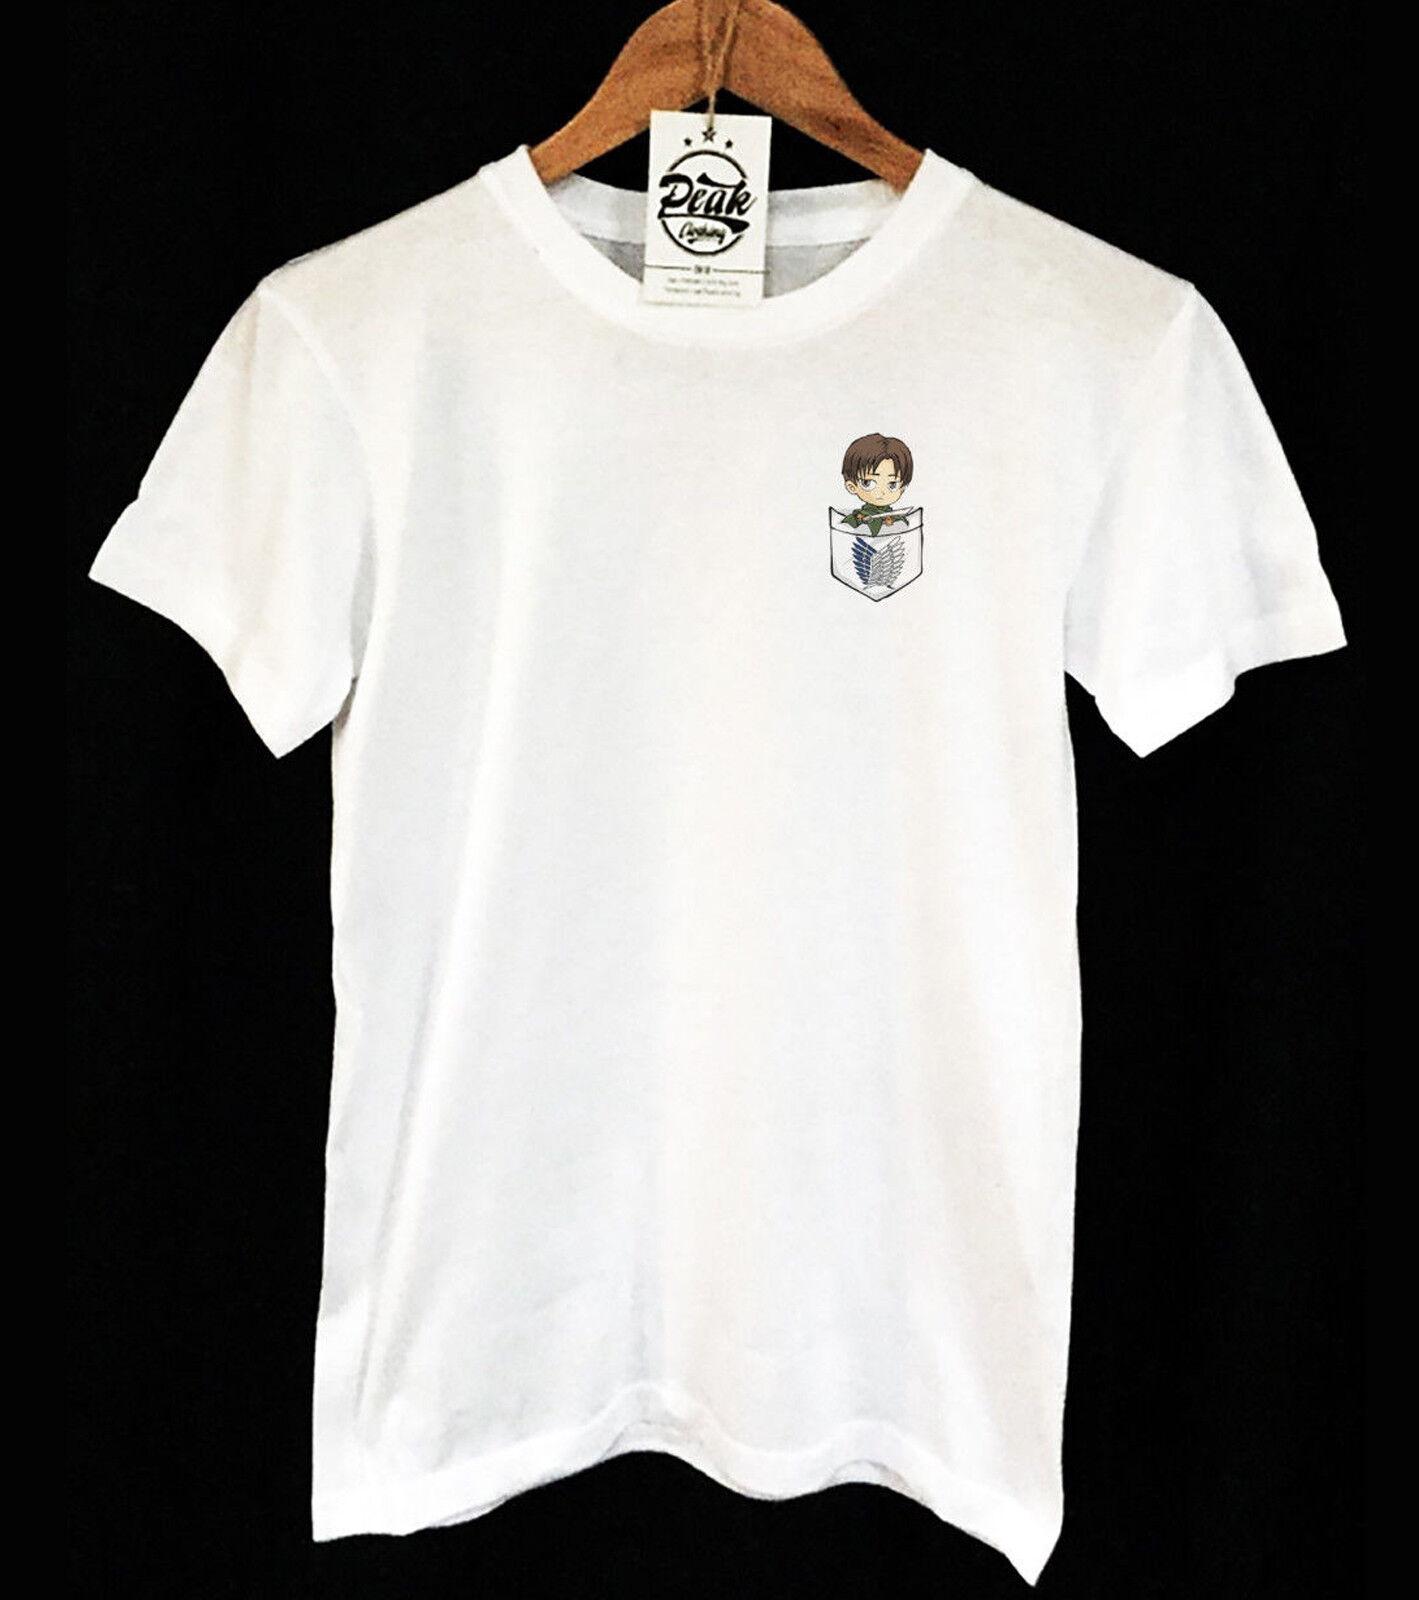 CHIBI CHIBI CHIBI eren Imprimer T-shirt poche-Attaque sur Titan-ANIME-vêtements pic-Unisexe 69e1dd